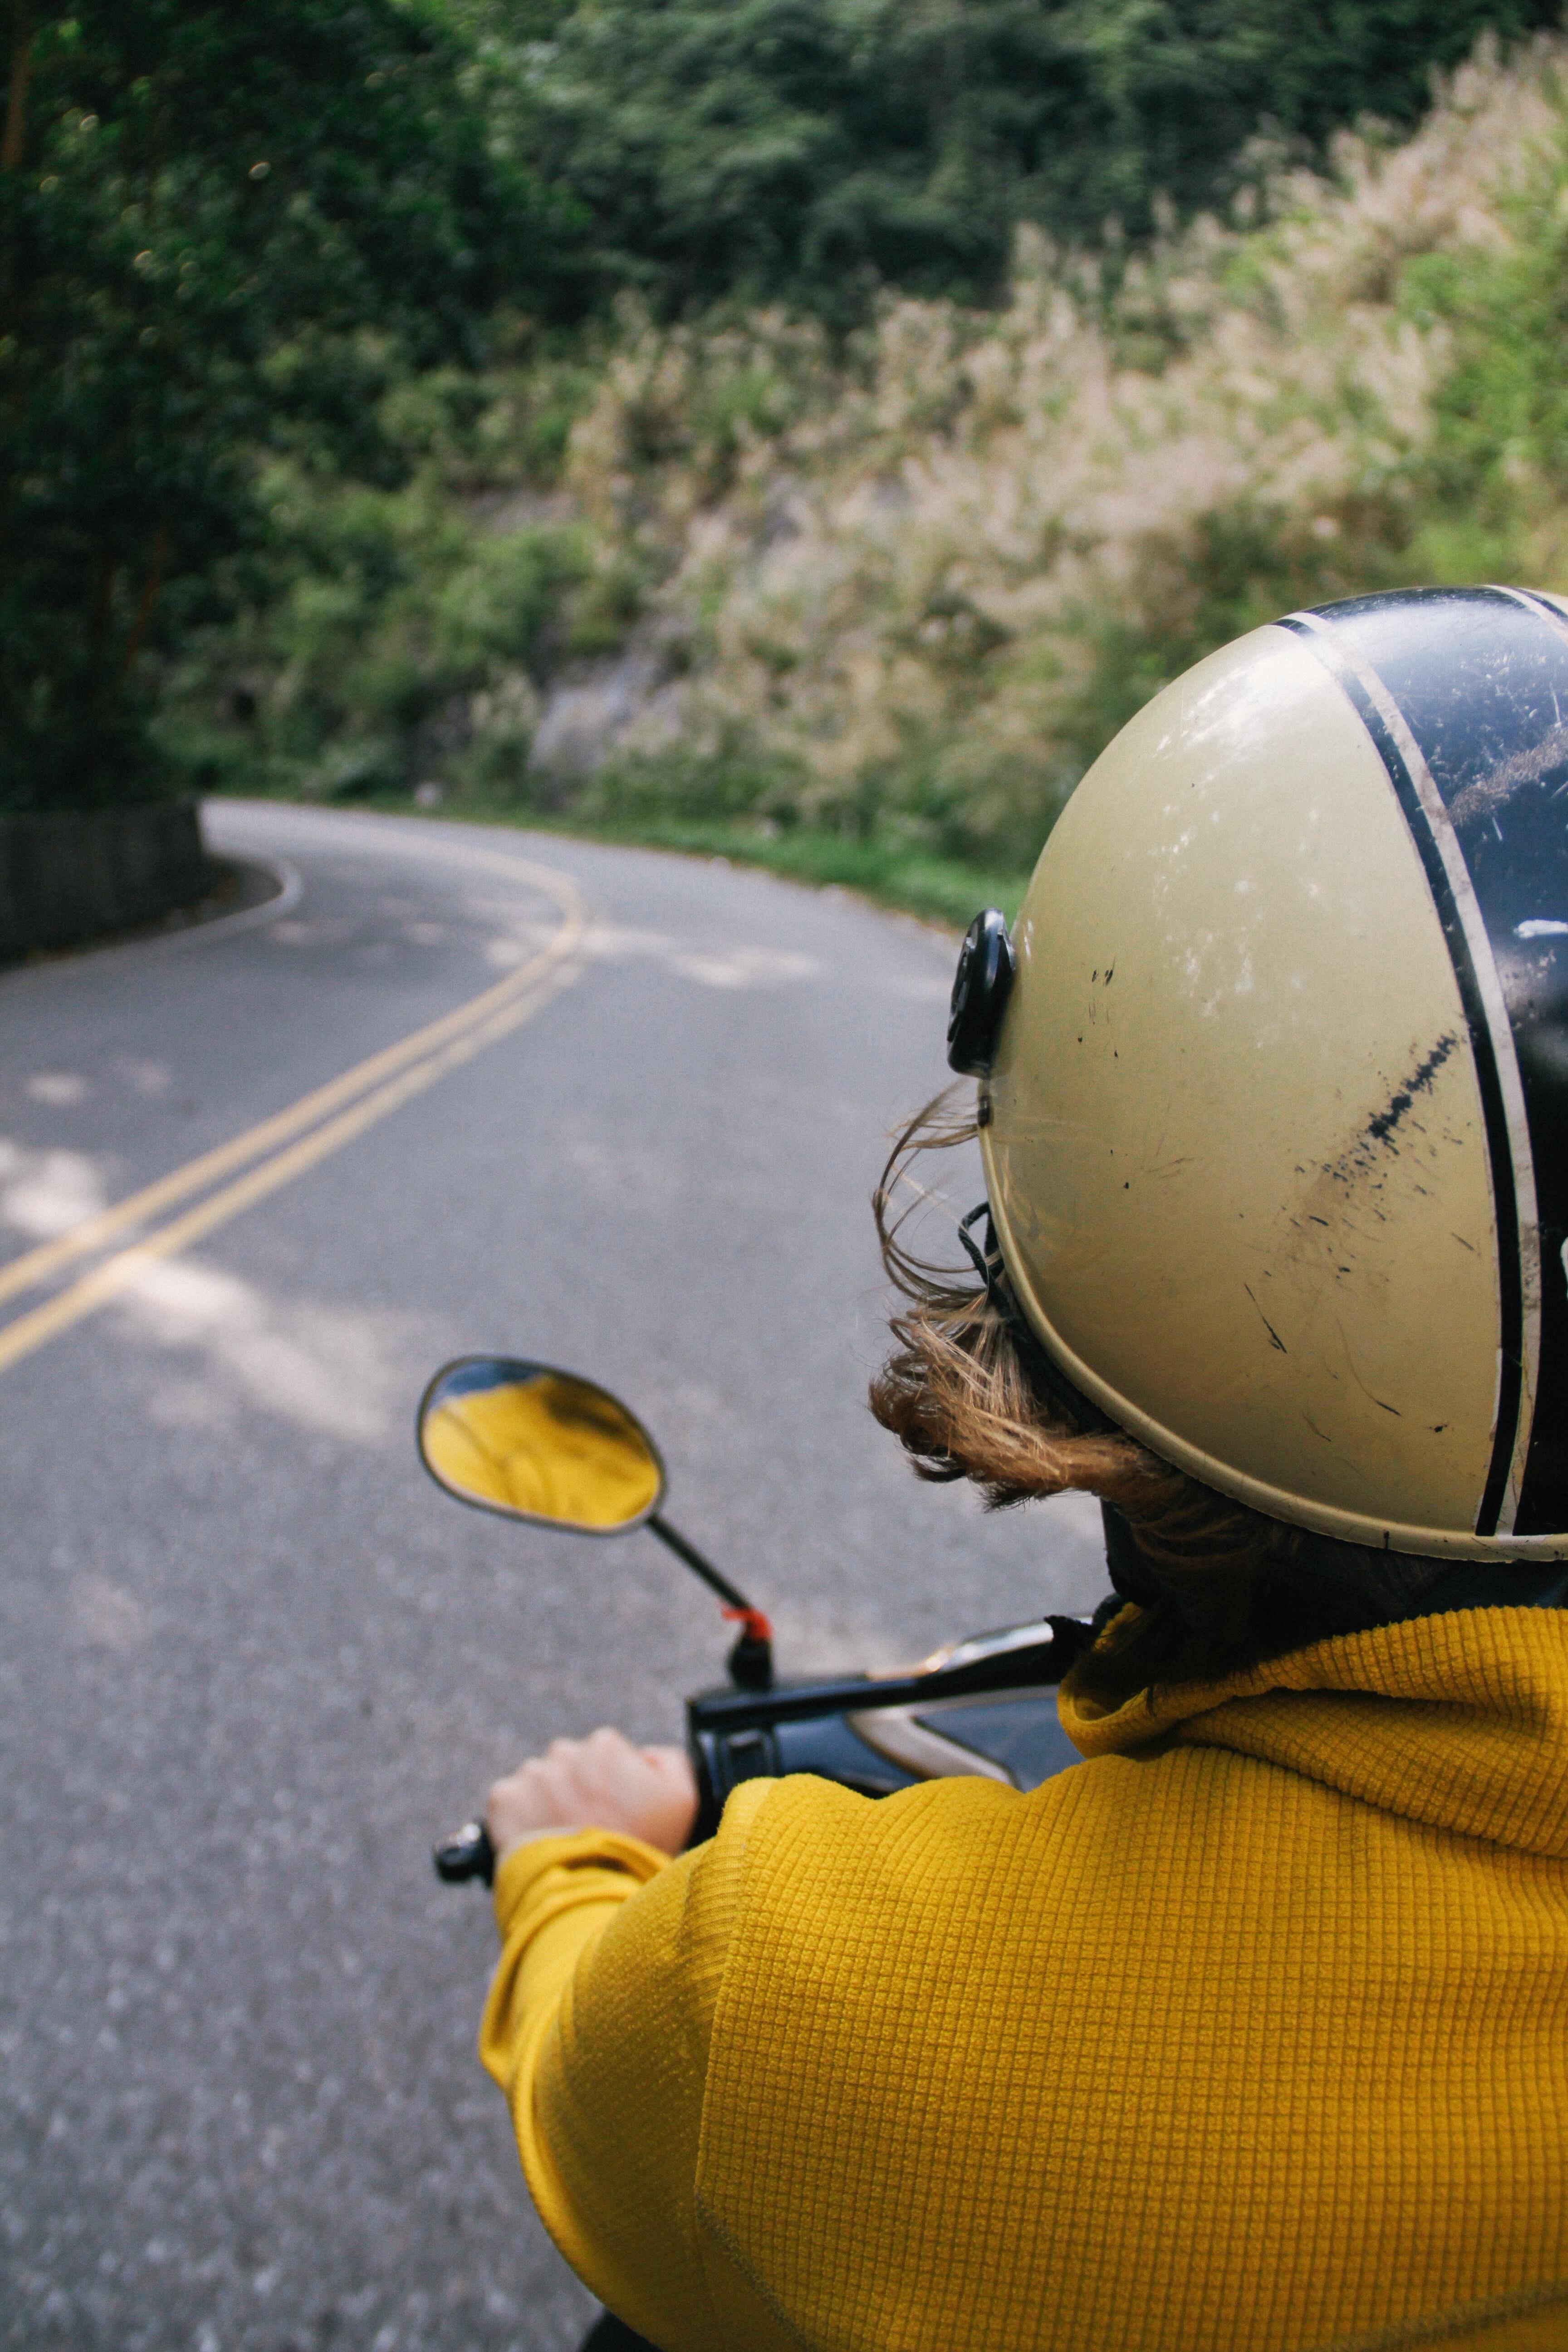 Couple Biker Pictures Download Free Images On Unsplash